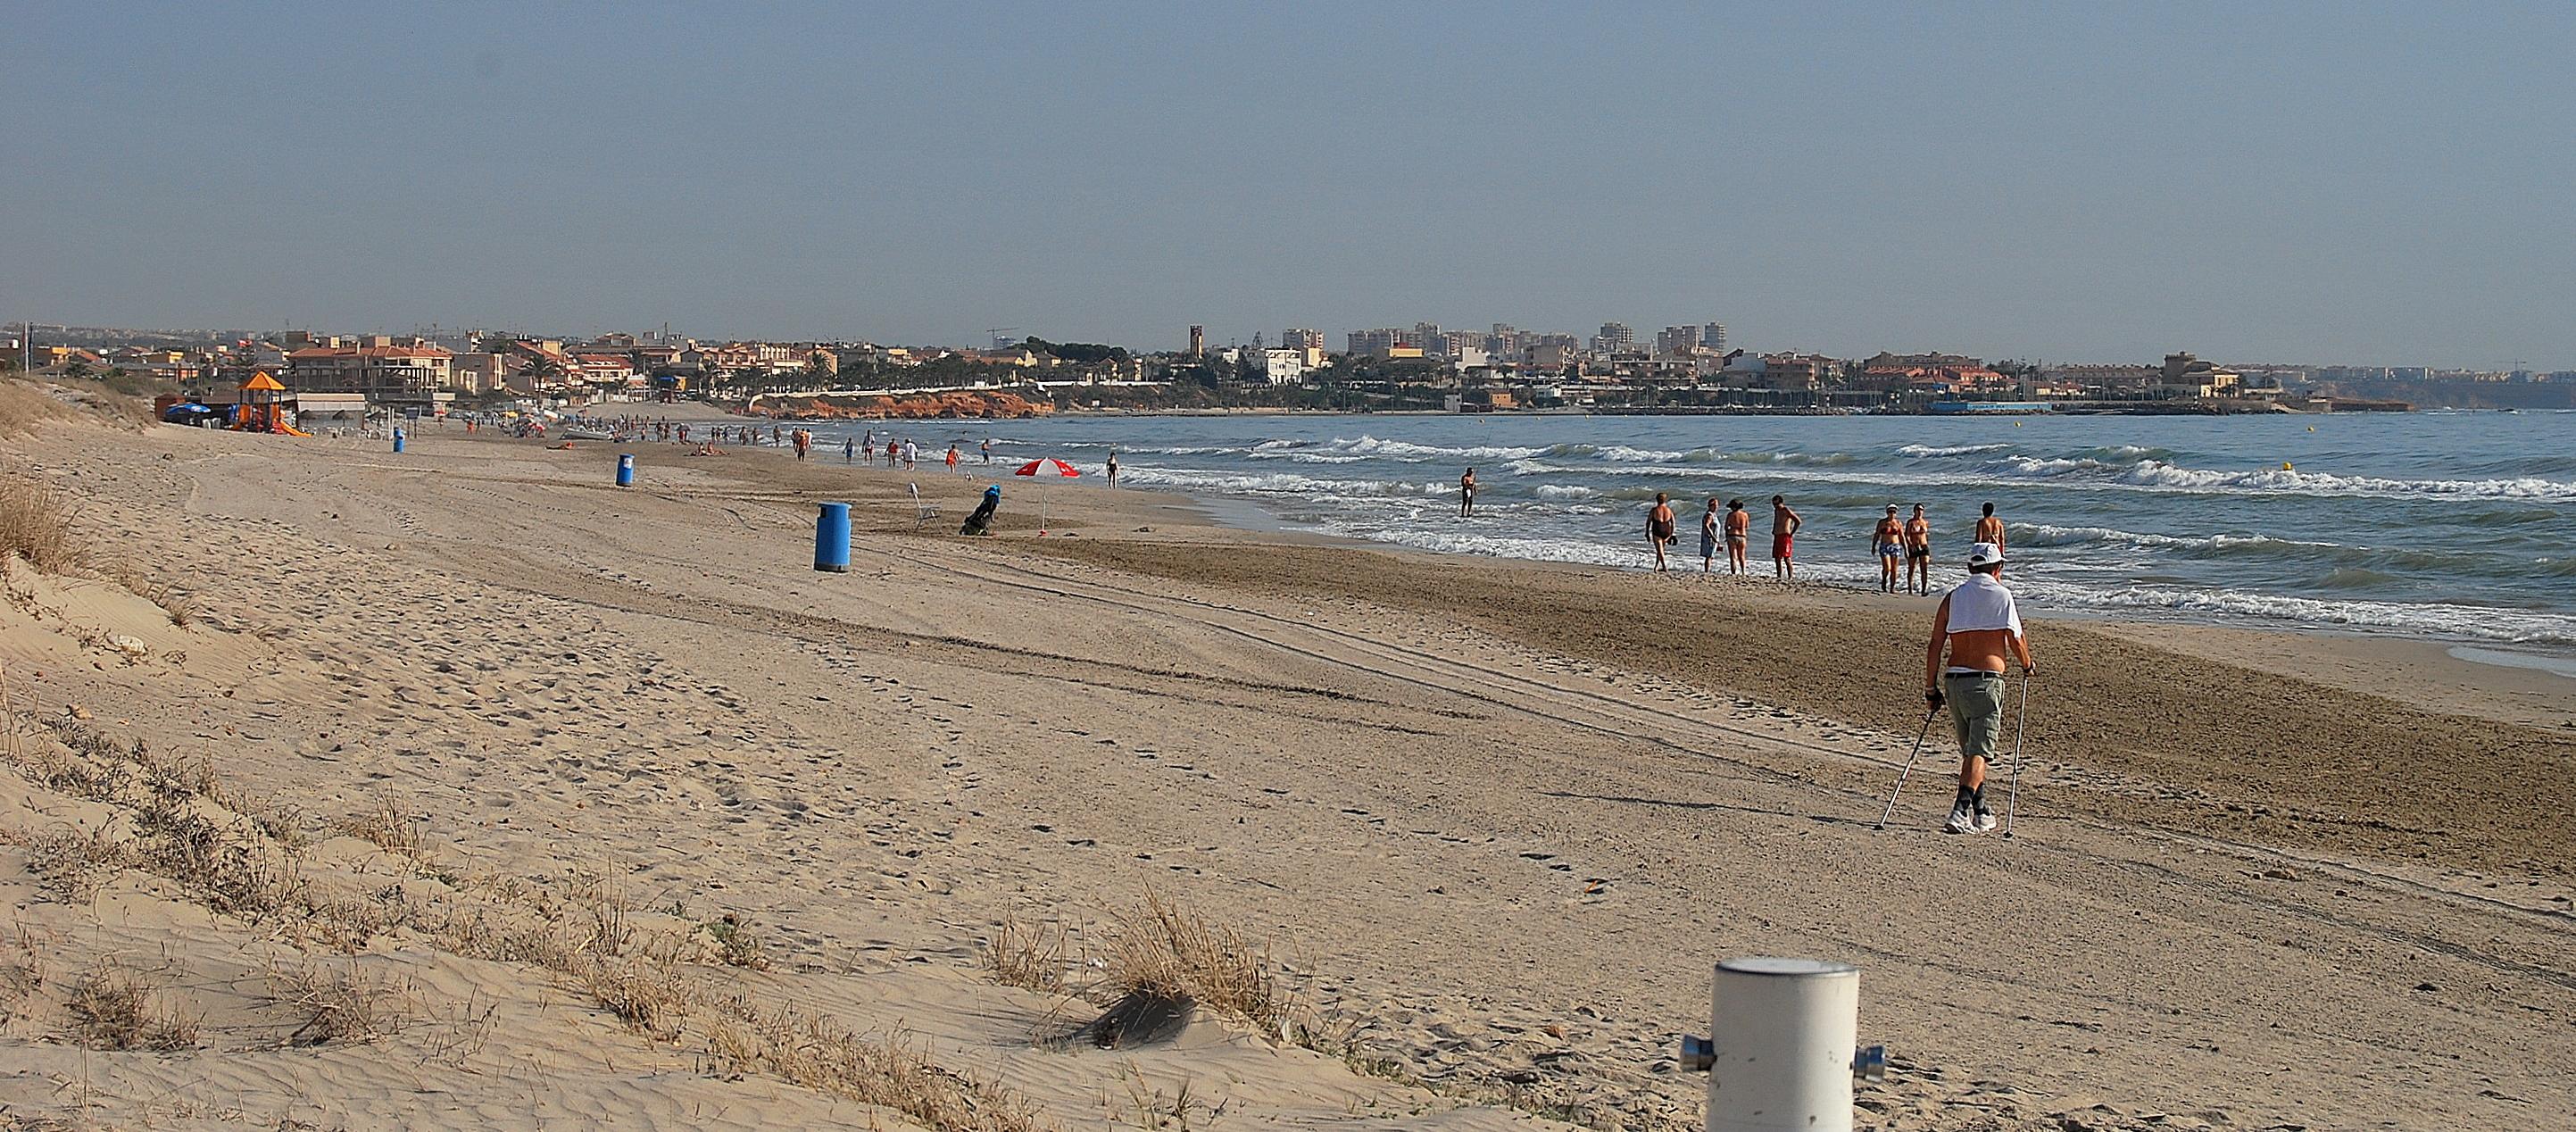 Foto playa El Mojón. El Mojón Beach